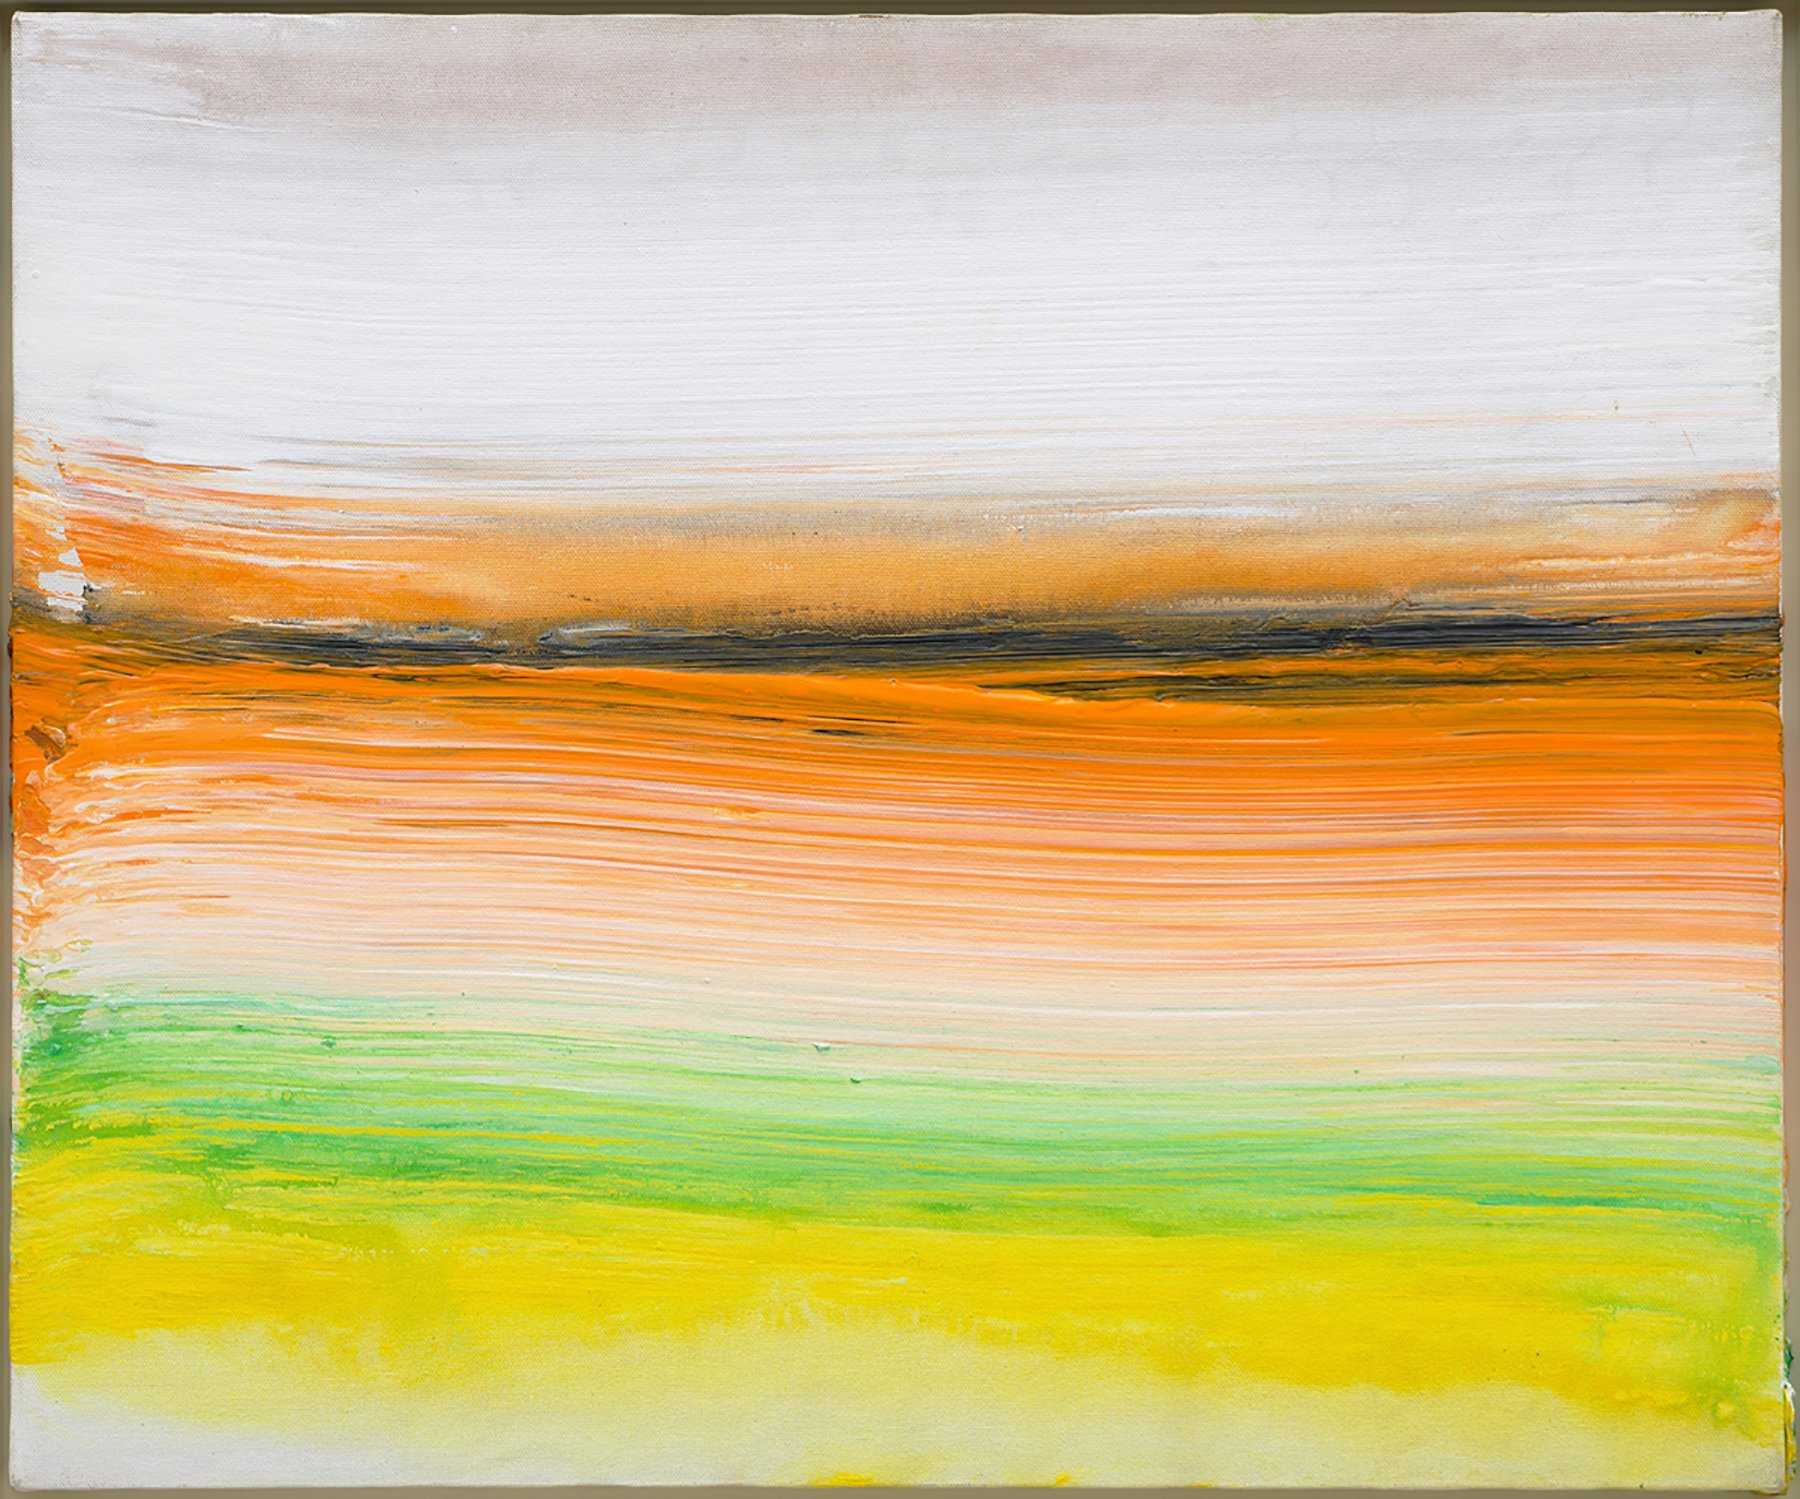 Color And Shape Frank Bowling Ed Clark And Sam Gilliam Xibt Contemporary Art Mag